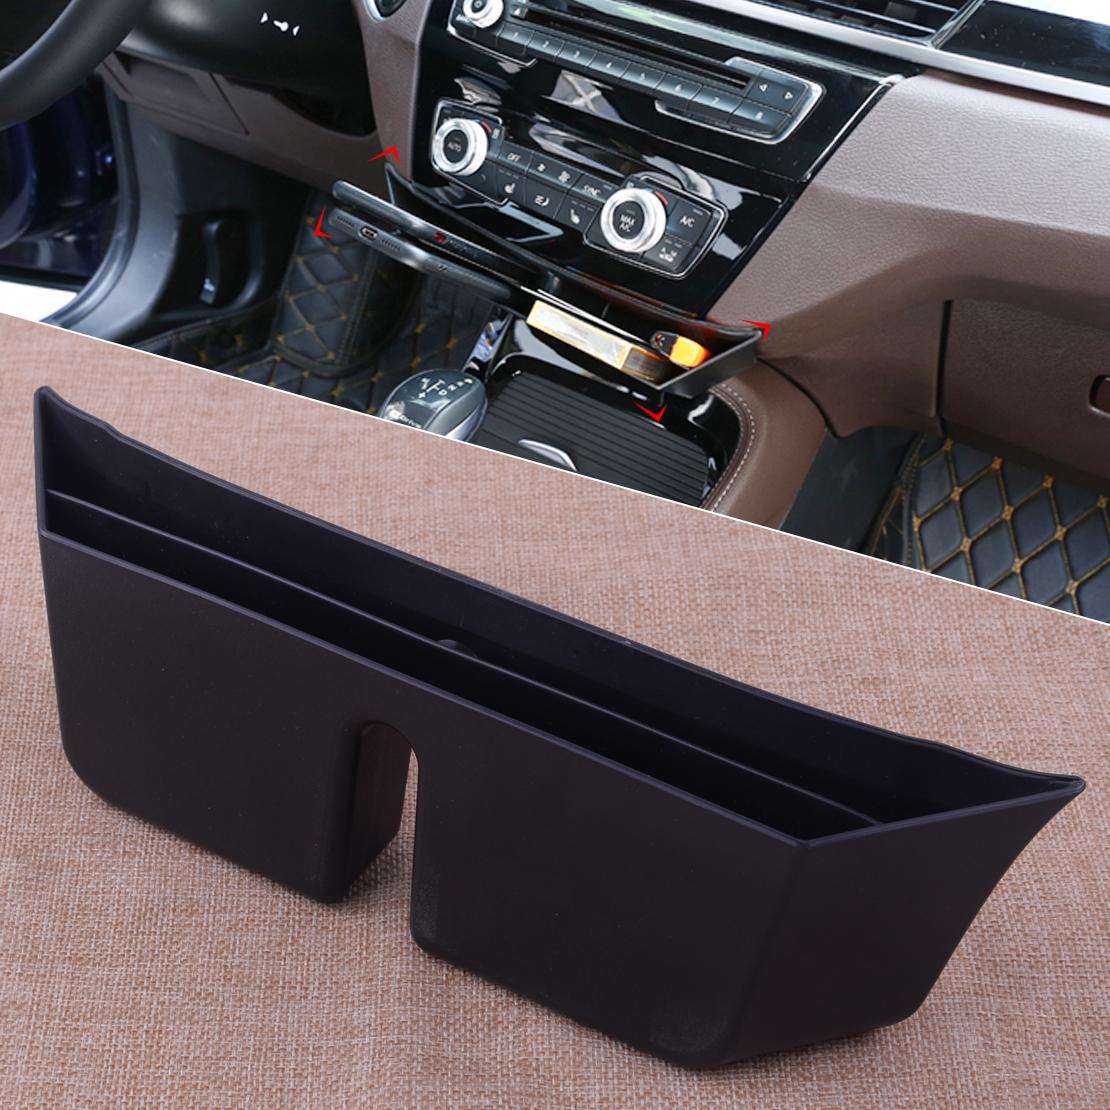 Car Black Abs Multifunction Center Console Storage Box Holder Case Organizer Fit For Bmw X1 F48 2016 2017 2018 Interior Accessories Cbib Cl